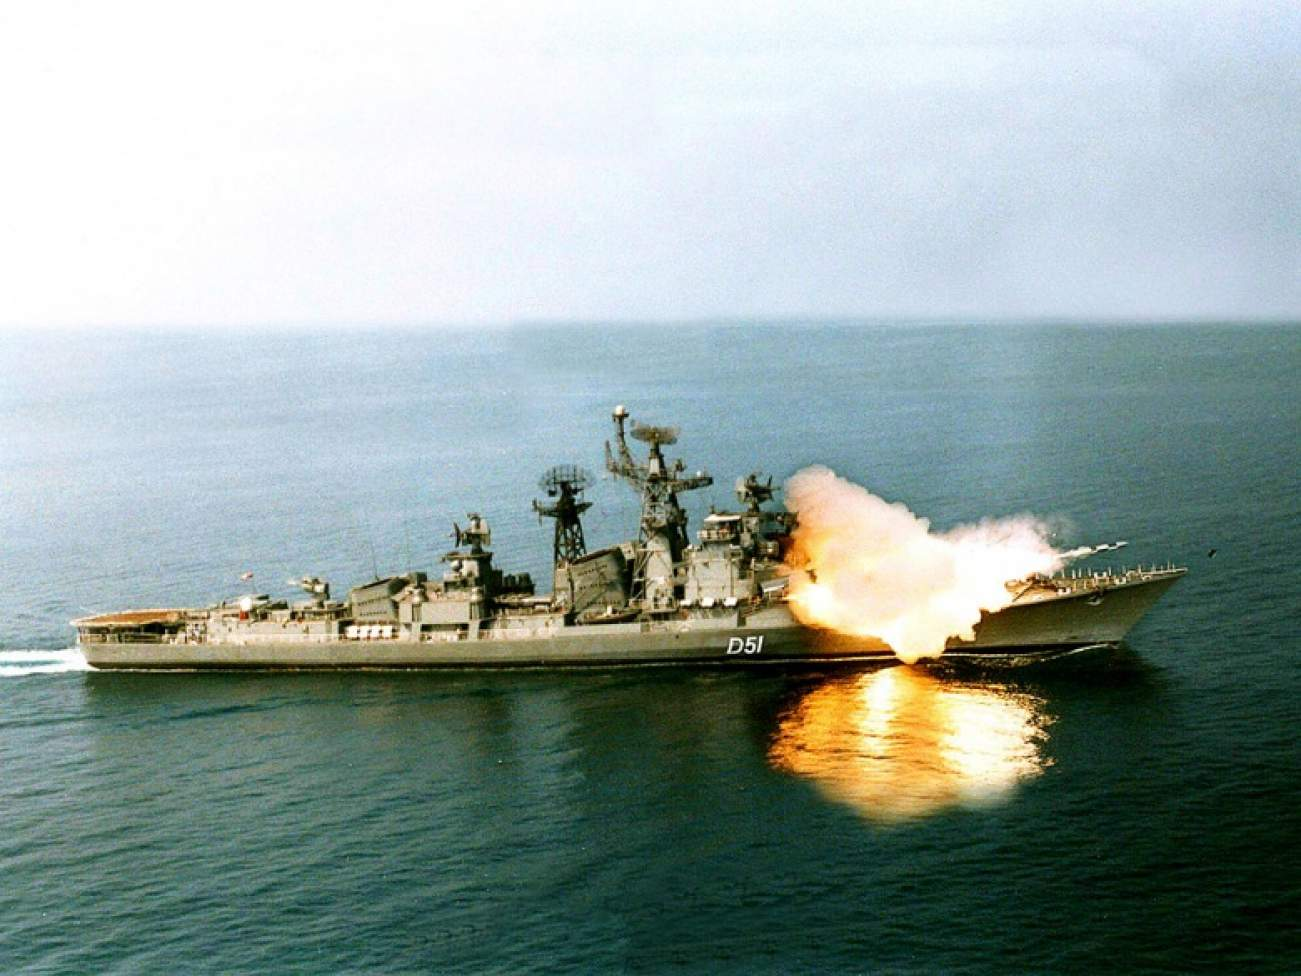 BrahMos: India's Supersonic Mega Missile That China Should